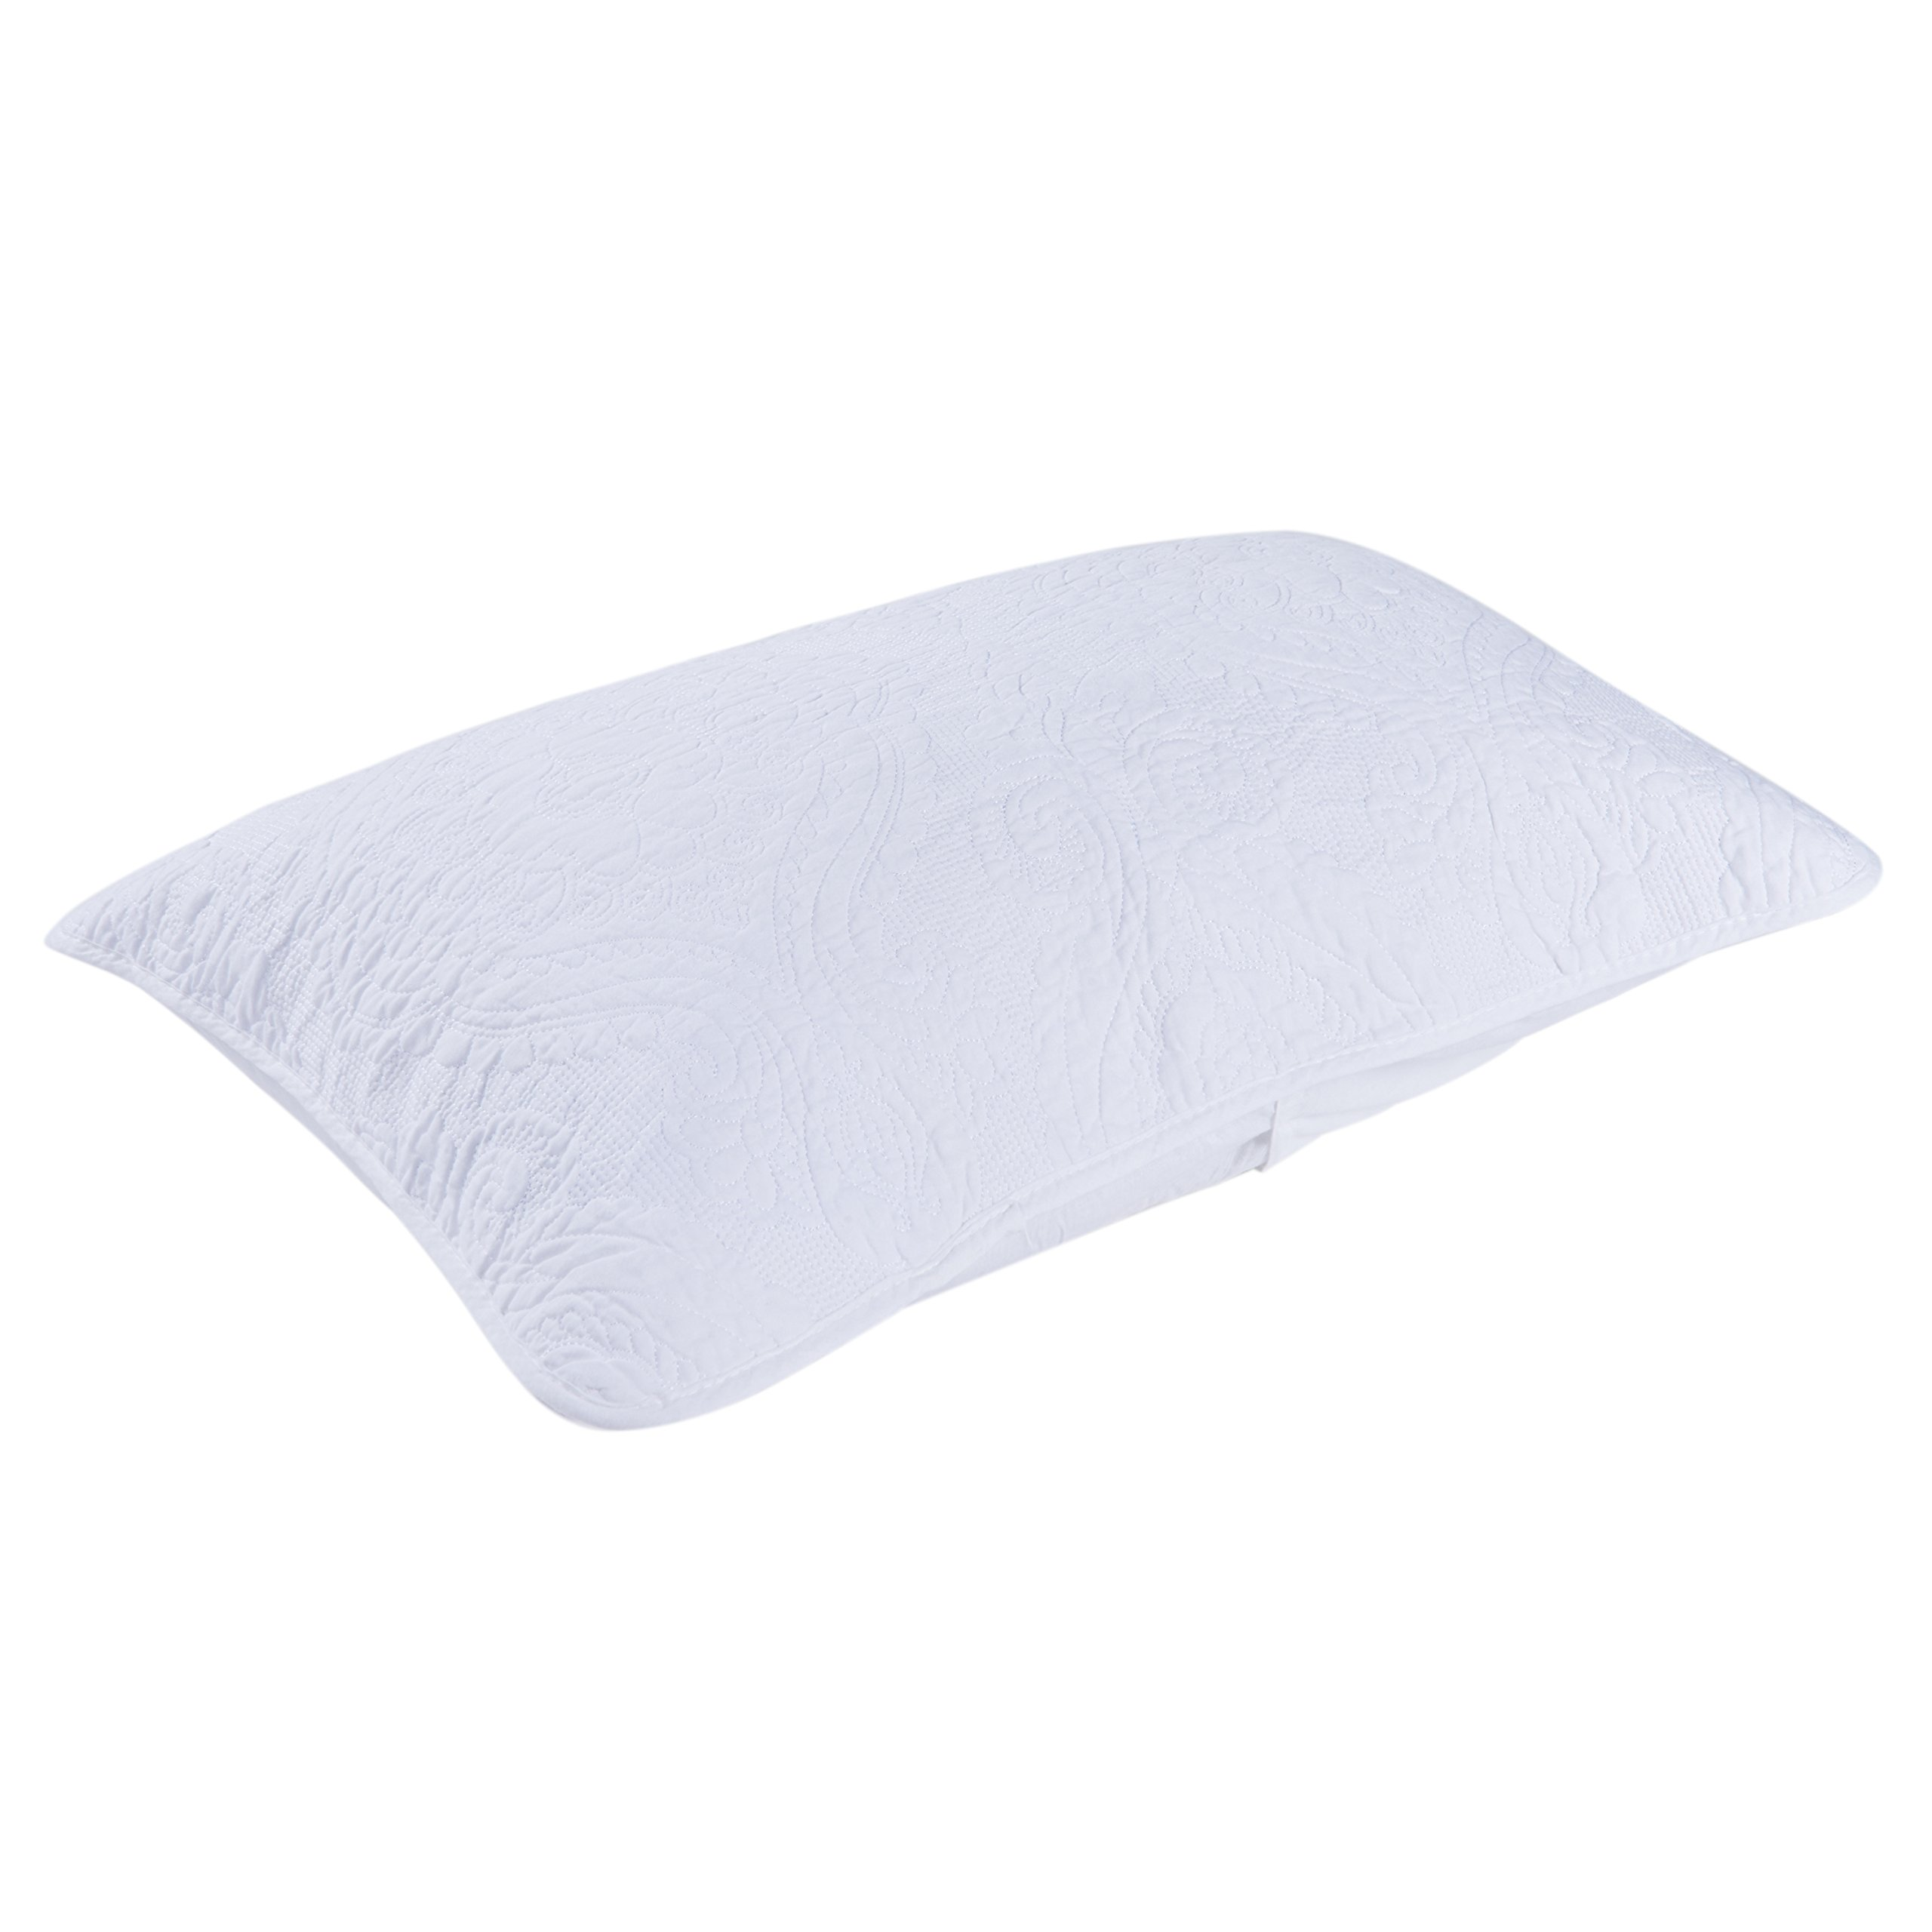 Moldiy White Damascus Floral Pattern Cotton 3 Pcs Quilt Sets,Quilt and Pillow Shams,King